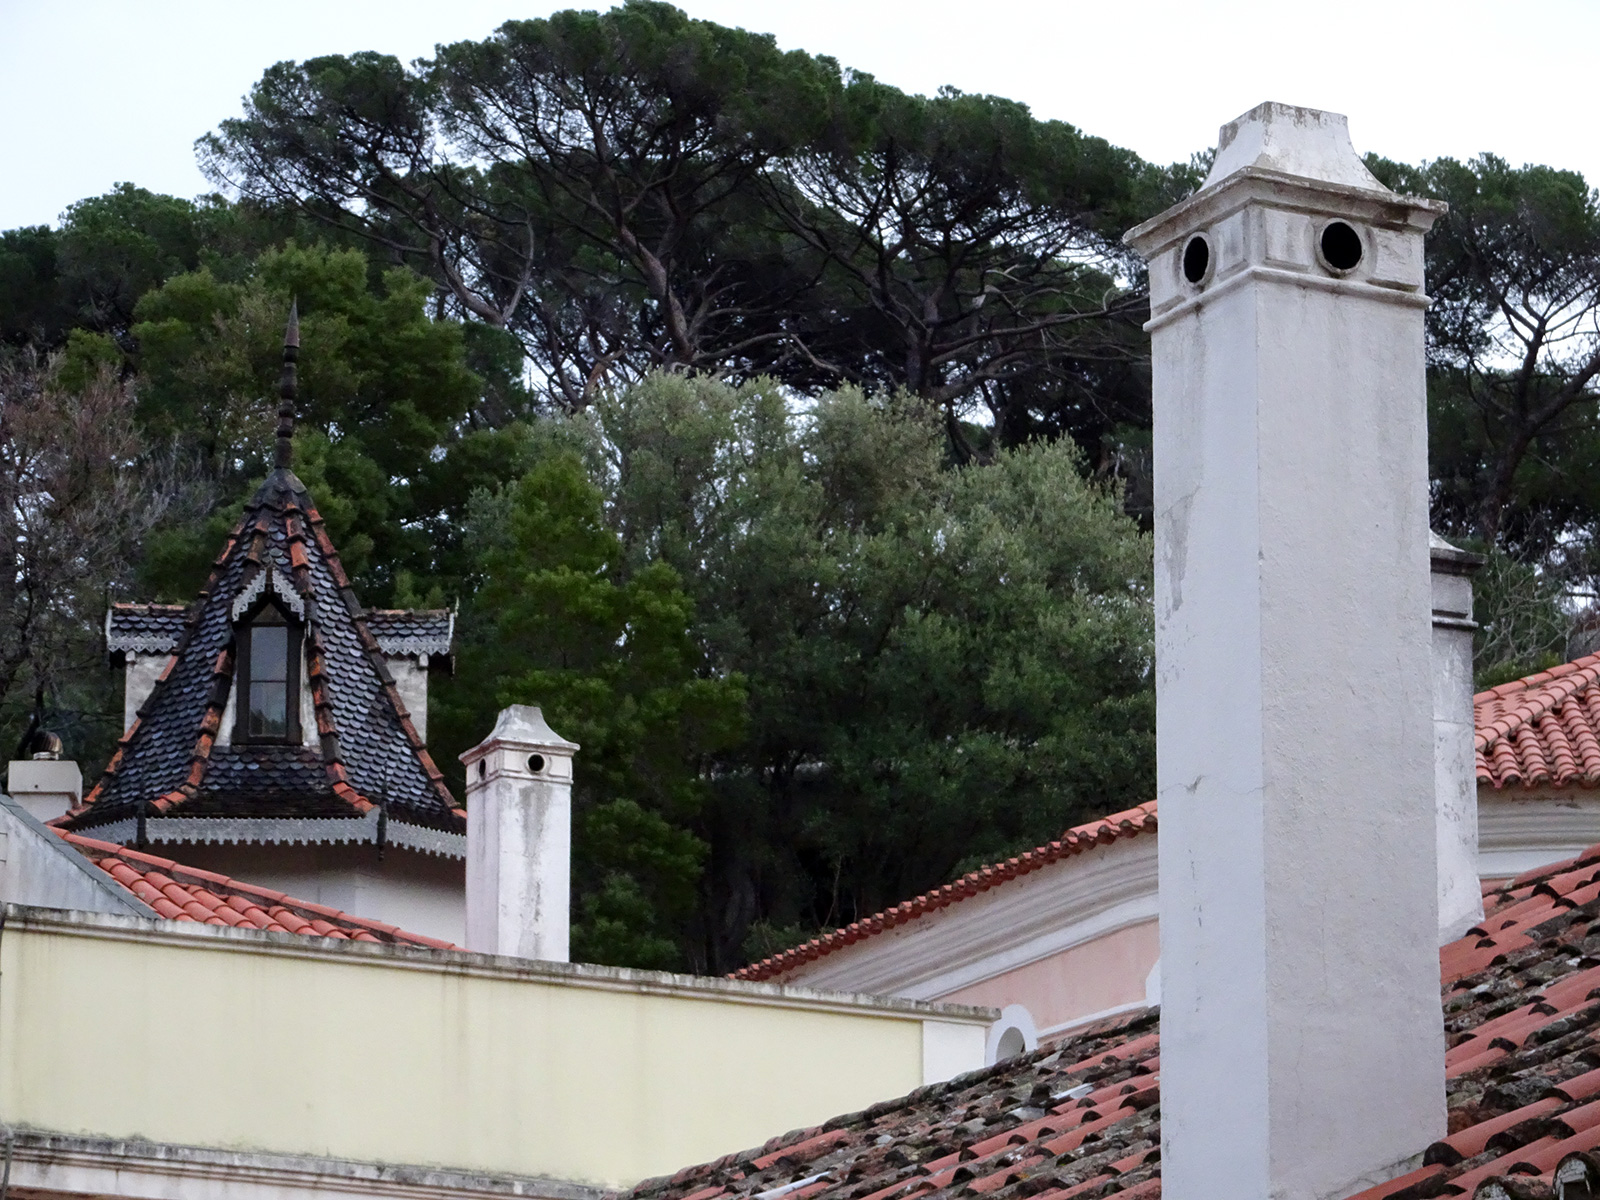 Caldas de Monchique, Portugal by Jets Like Taxis